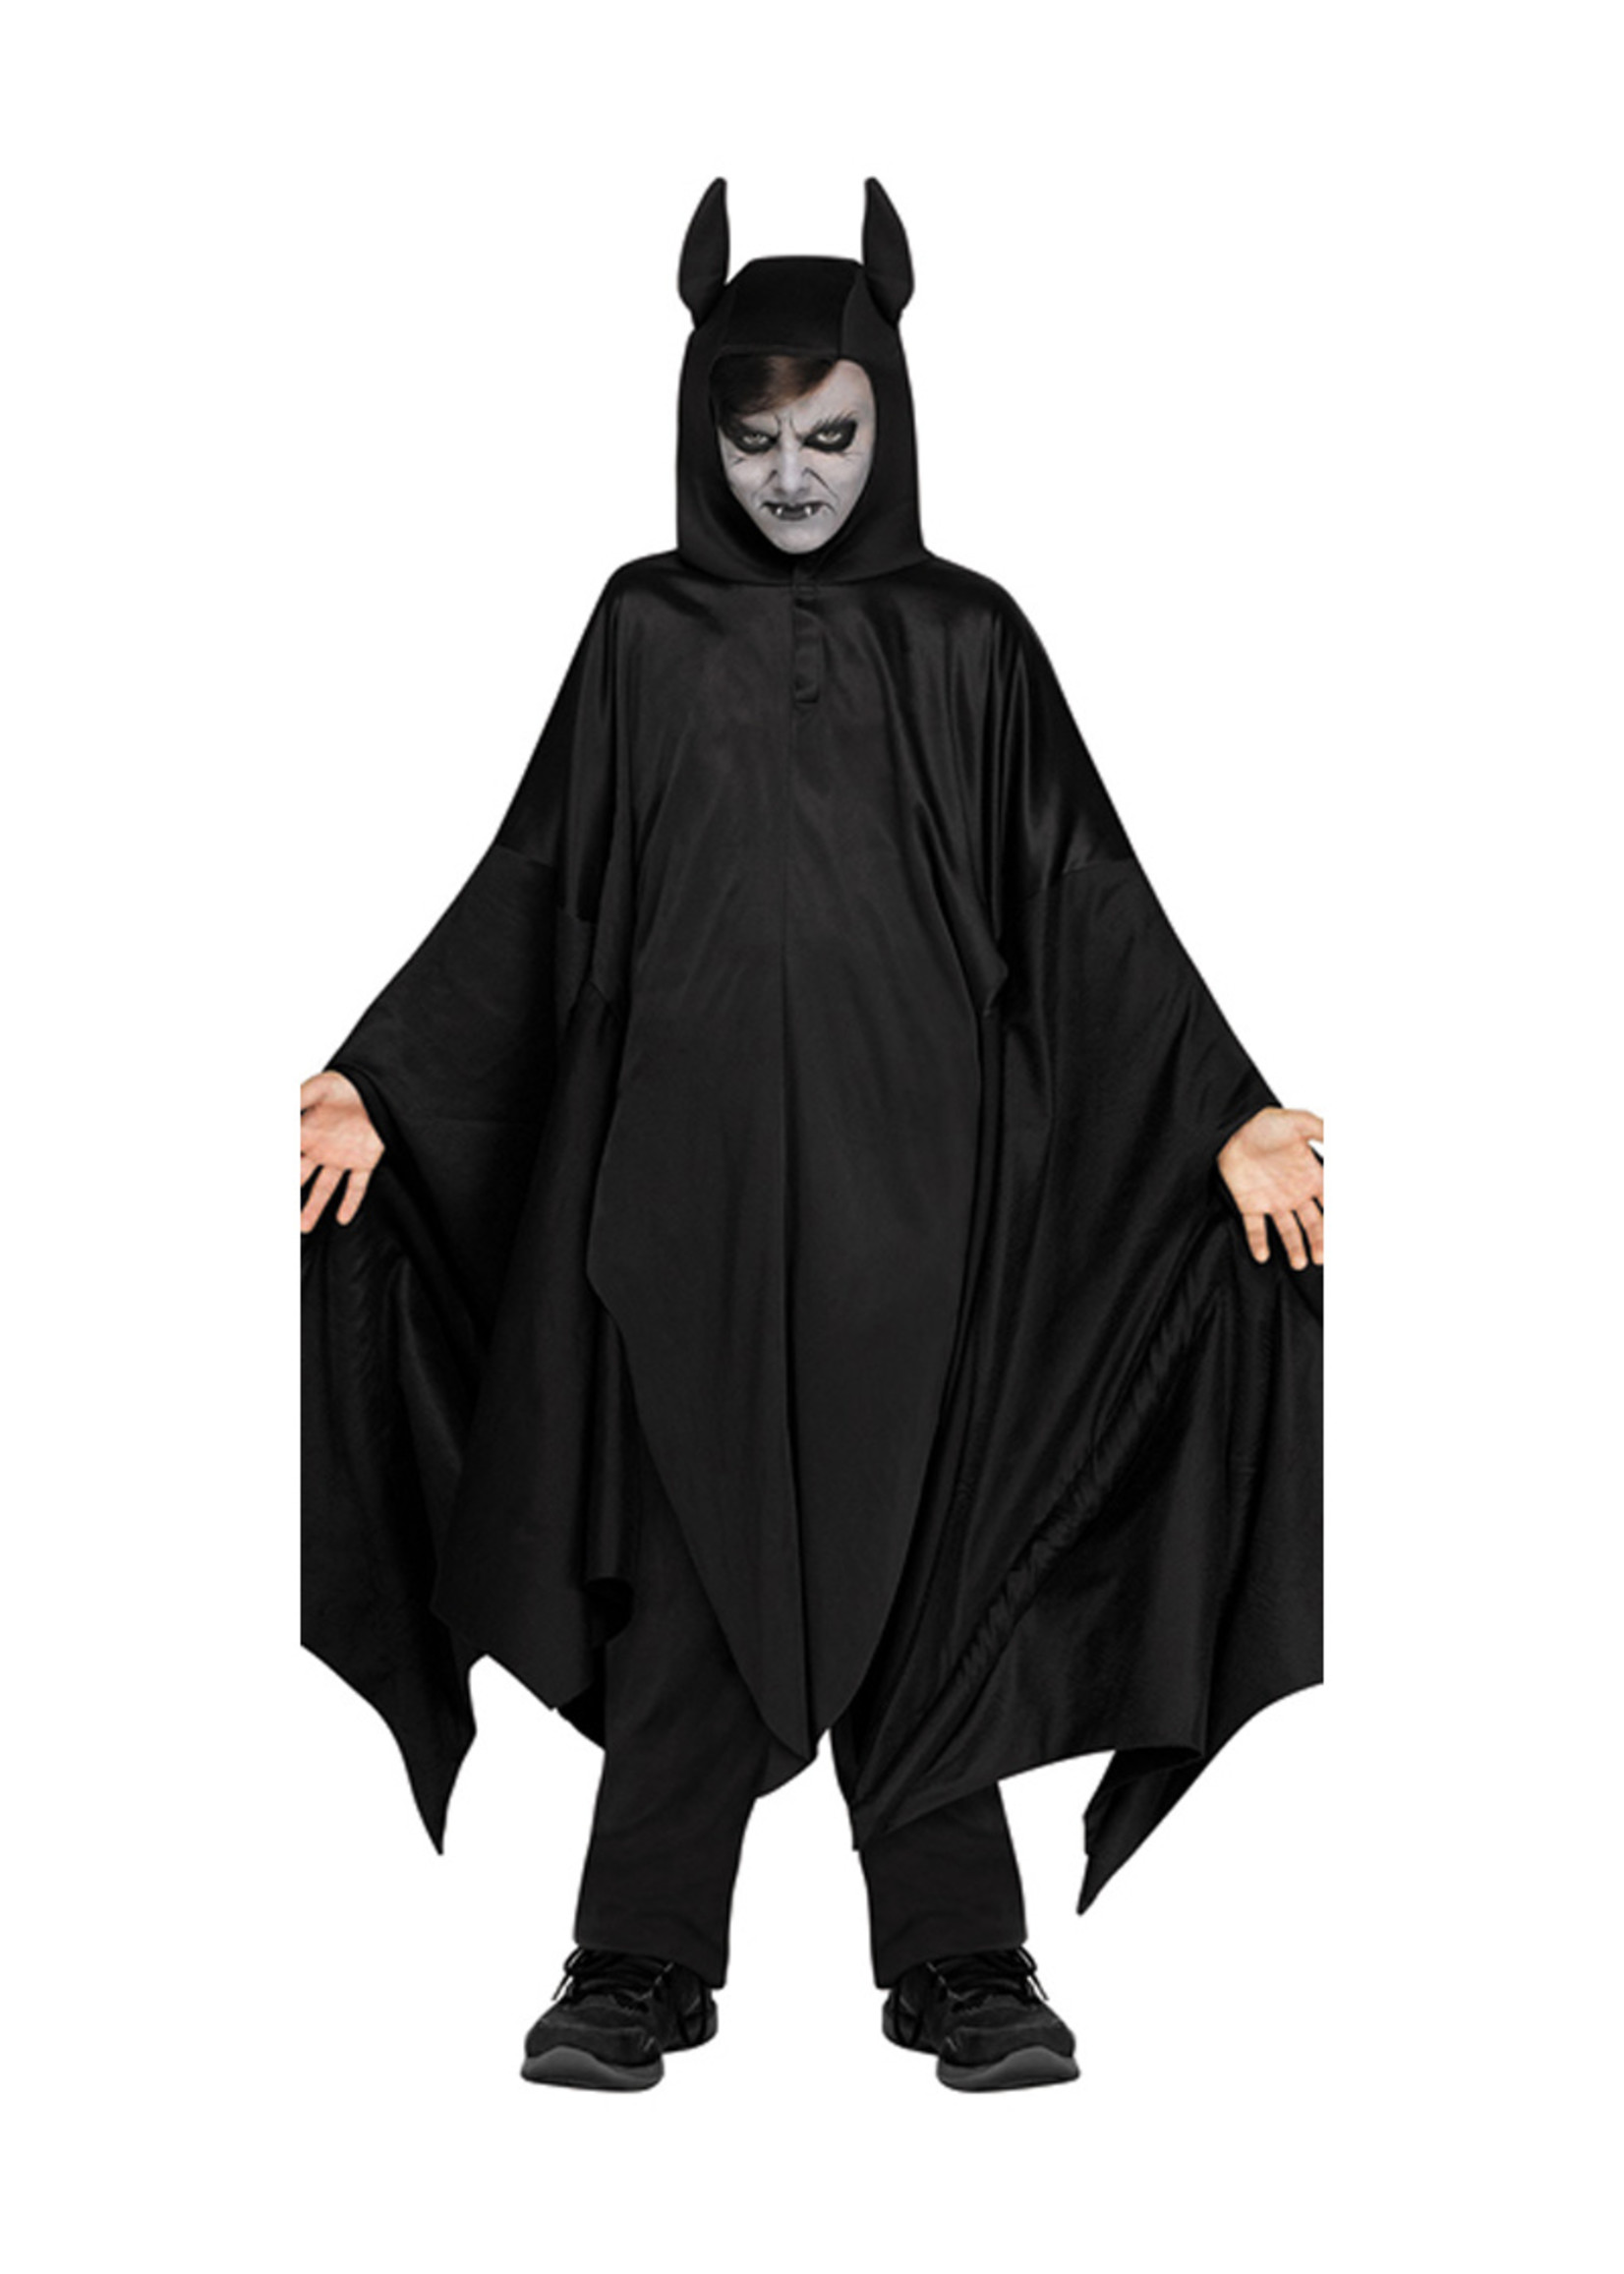 Wicked Winged Bat Costume - Boys